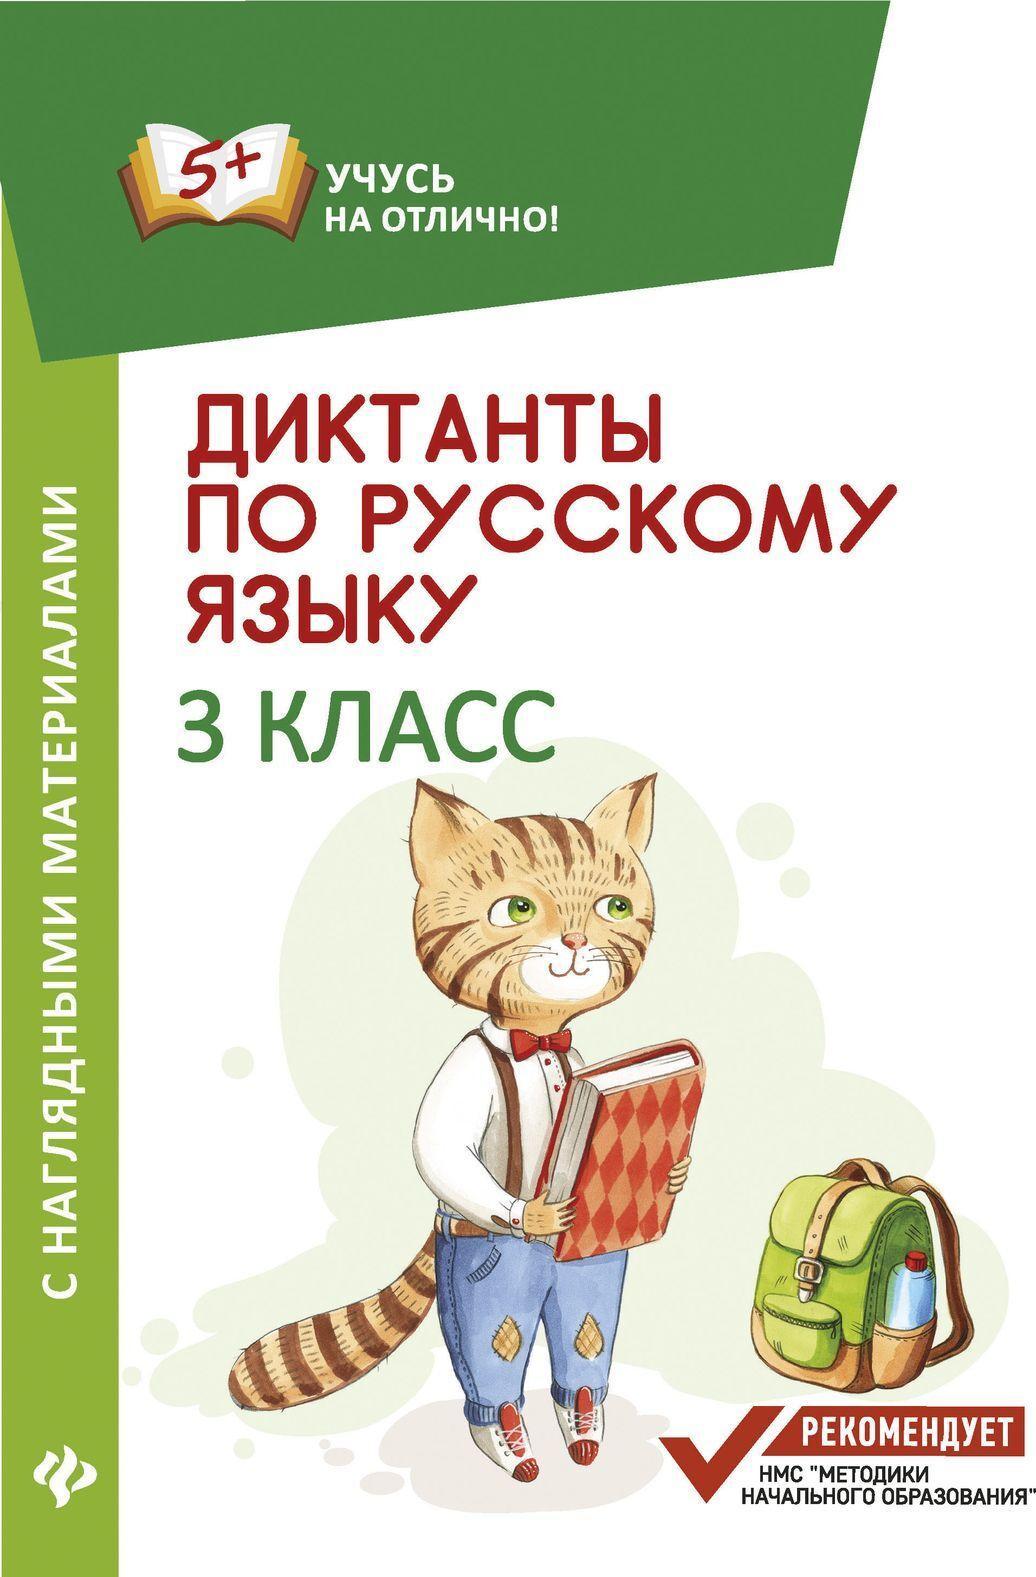 Russkij jazyk. 3 klass. Diktanty s nagljadnymi materialami